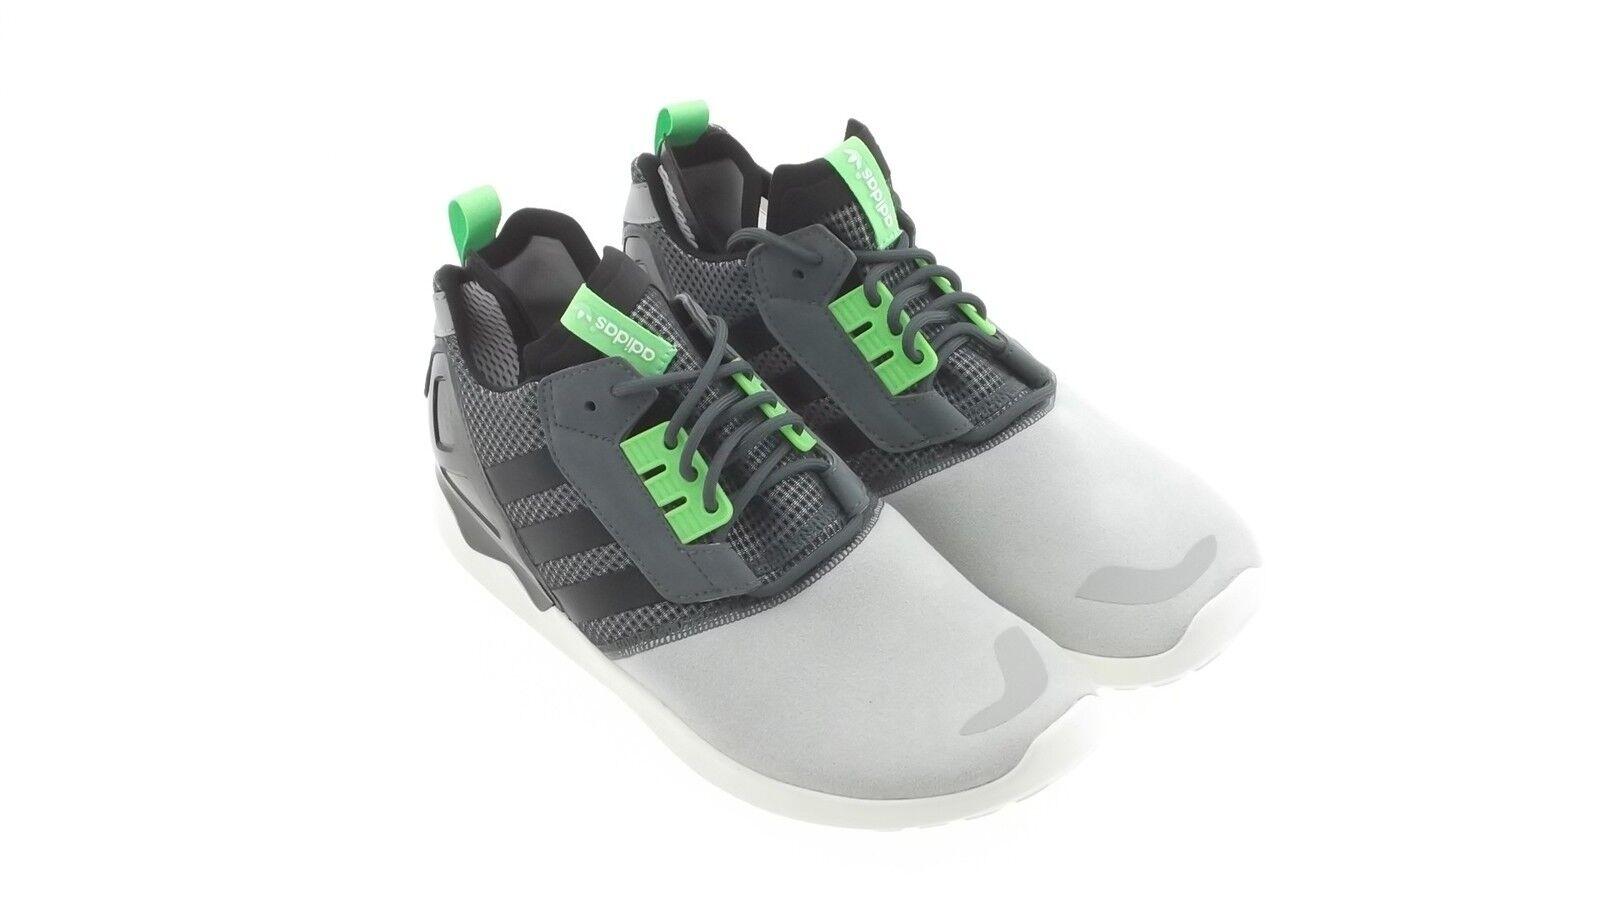 Details zu Nike Damen Sneaker Modell Air Max 1 Vintage 555284 100 Mehrfarbig Gr.39 *TOP*